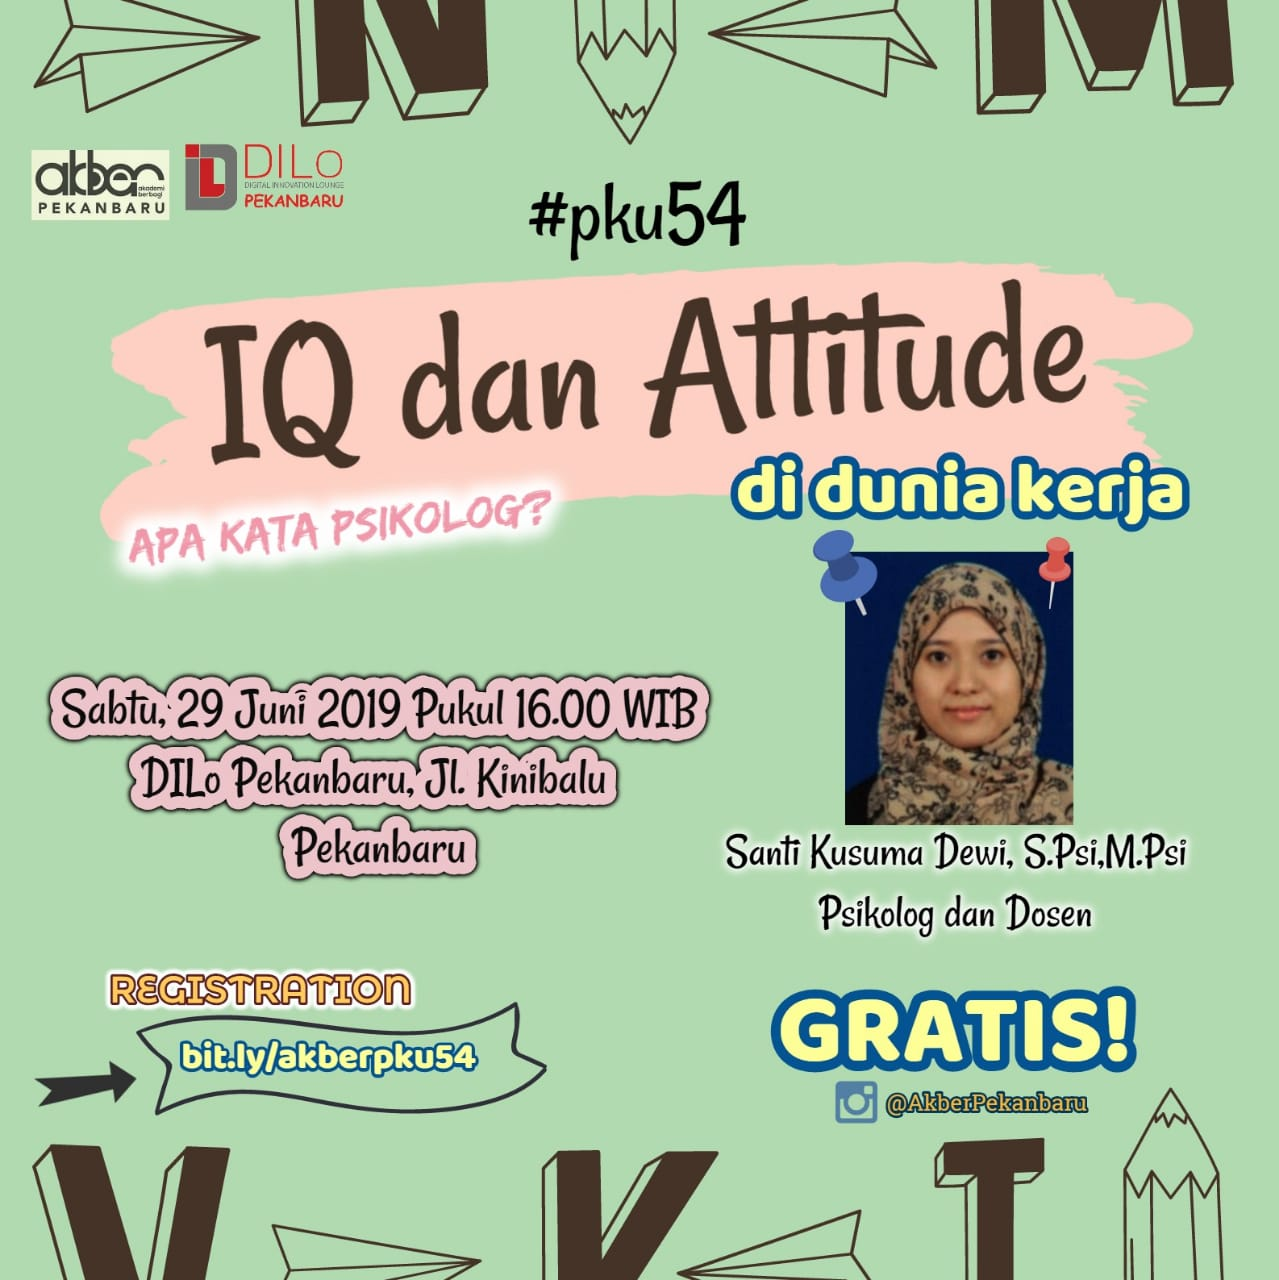 Pekanbaru: IQ dan Attitude di Dunia Kerja